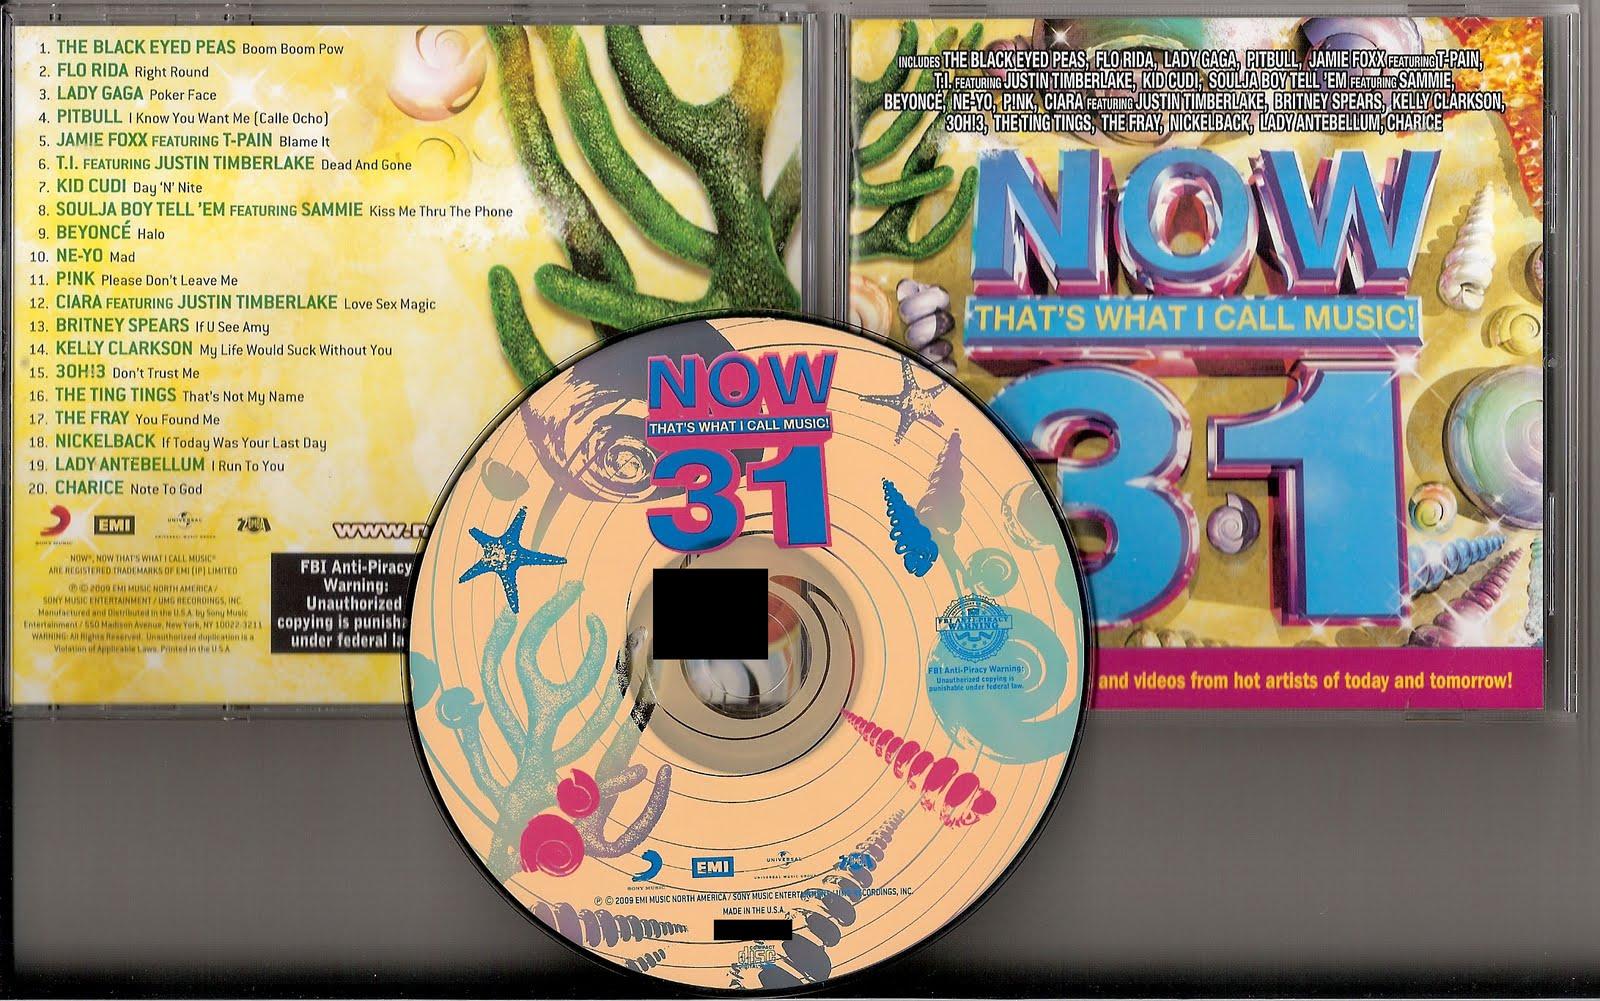 http://4.bp.blogspot.com/_9cw-jhhRBE4/TNRds4D2ftI/AAAAAAAAGTA/GGHyRmkrE30/s1600/00-va-now_thats_what_i_call_music_31-%28us_retail%29-2009-scan.jpg